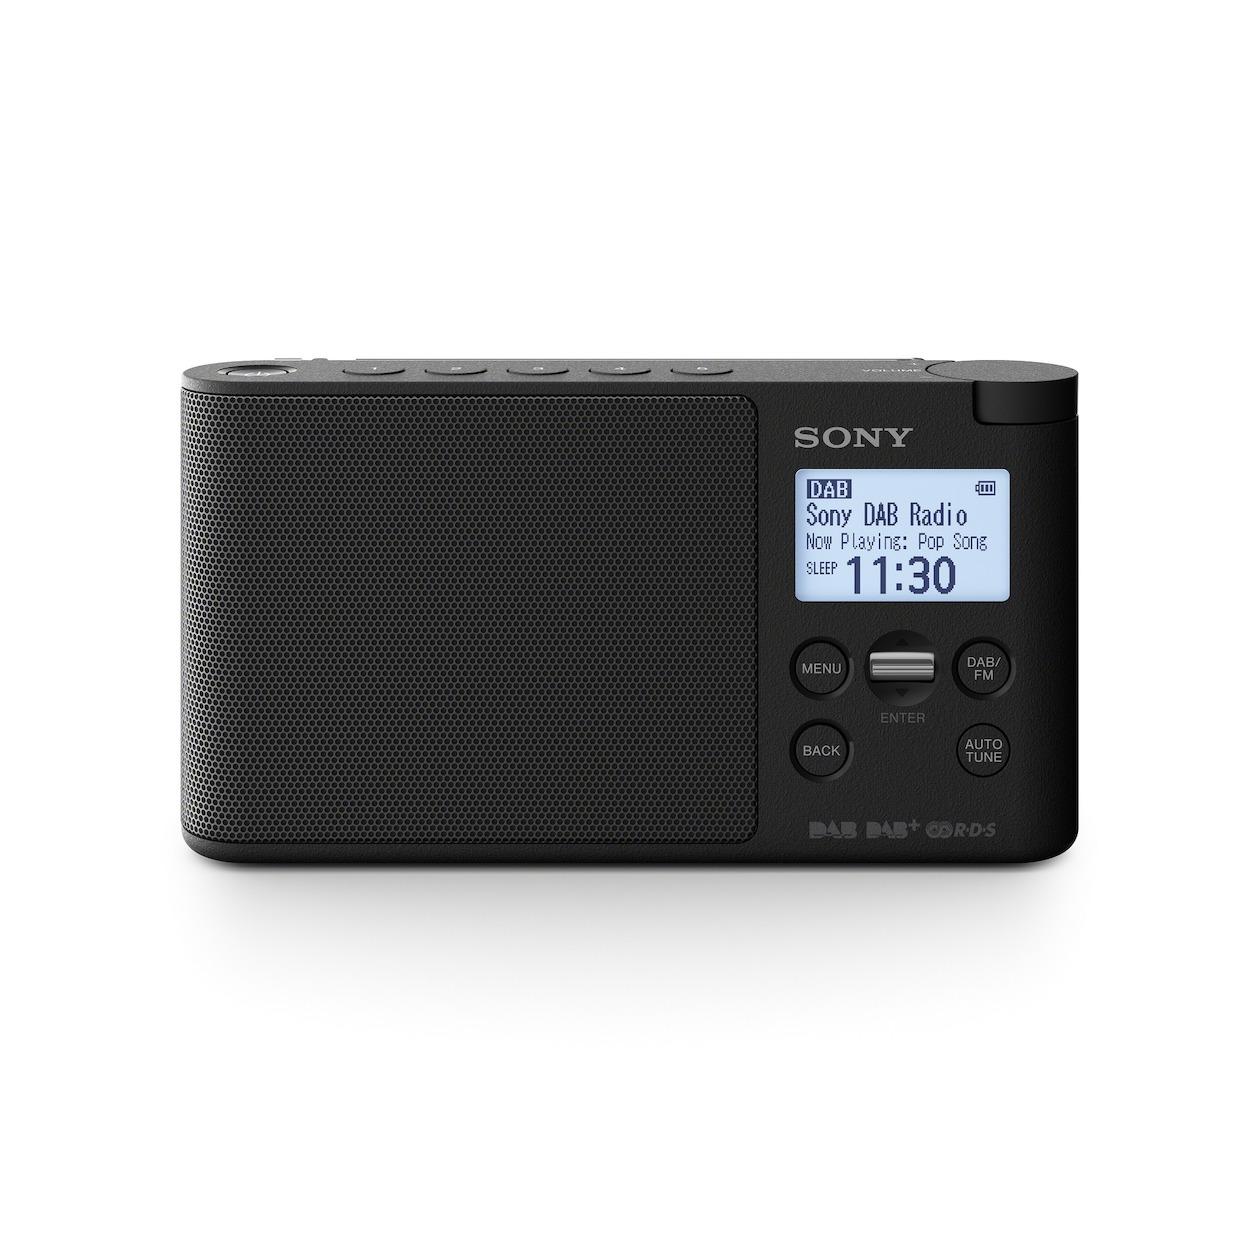 Sony XDRS41DB.EU8